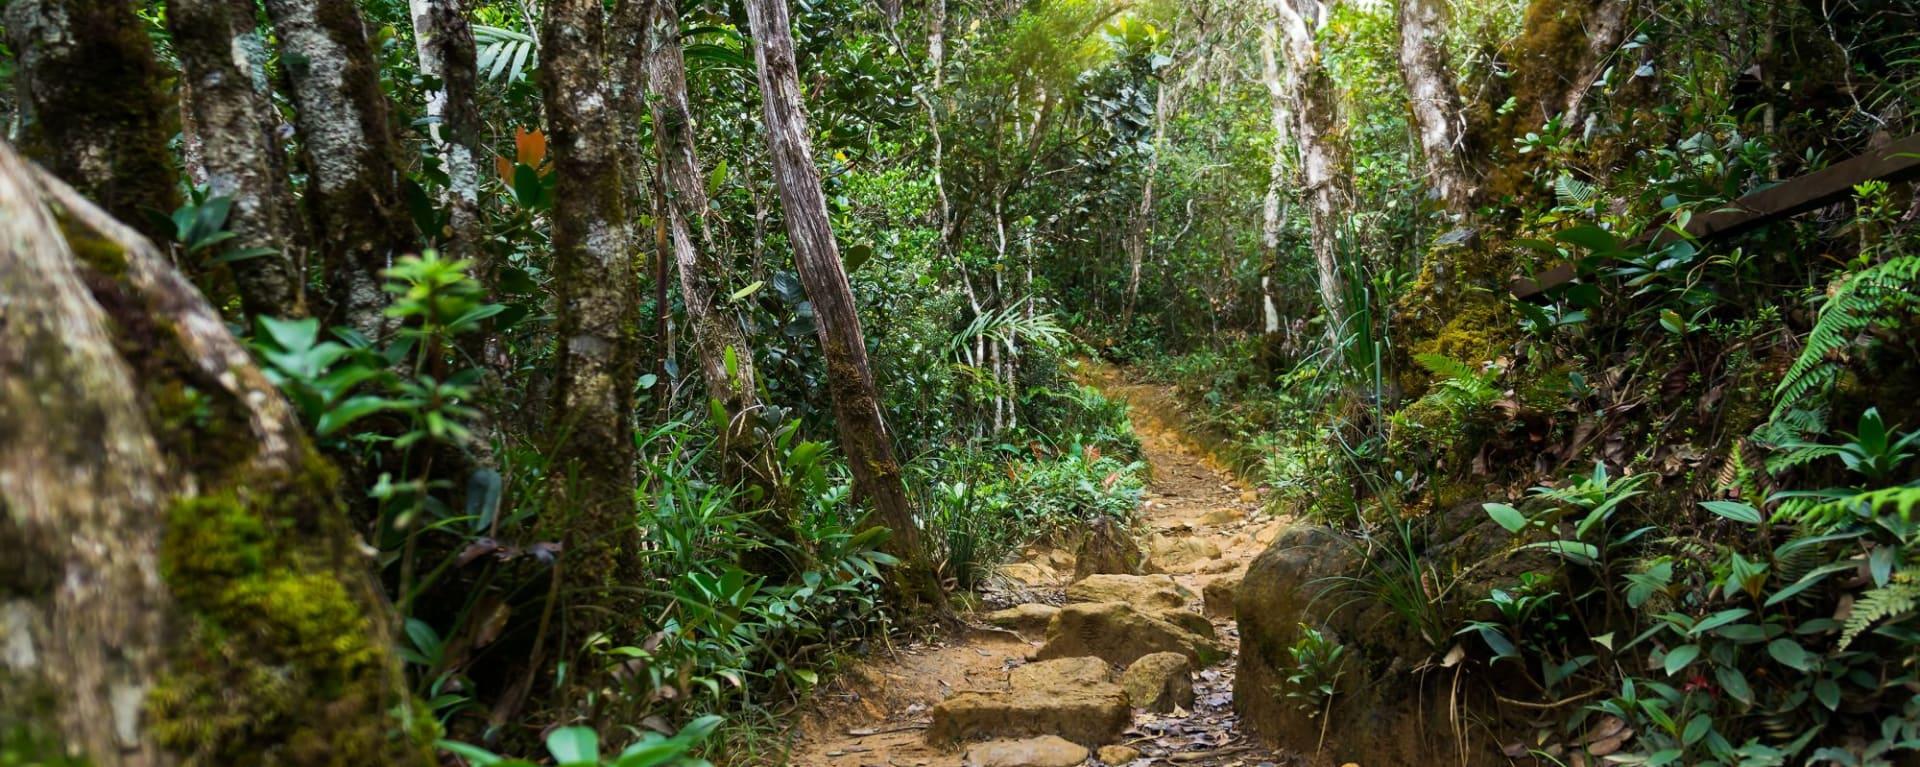 Mt. Kinabalu Park in Kota Kinabalu: Kinabalu Park: Nature rain forest with morning sunlight